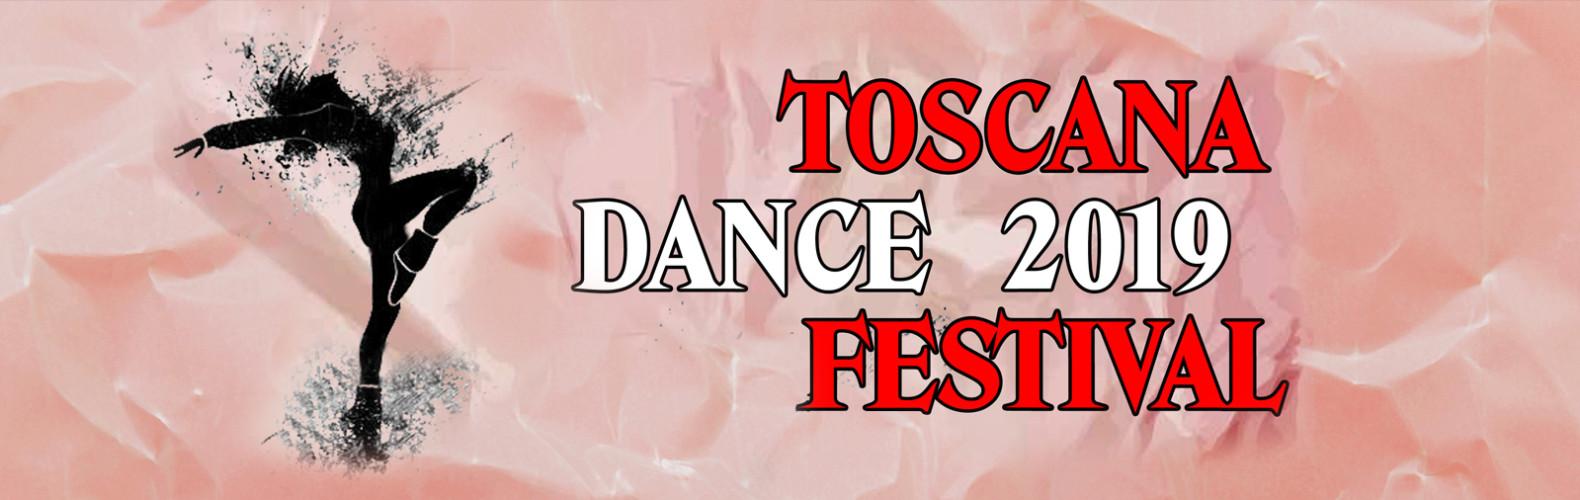 TOSCANA-DANCE-FESTIVAL-Mod